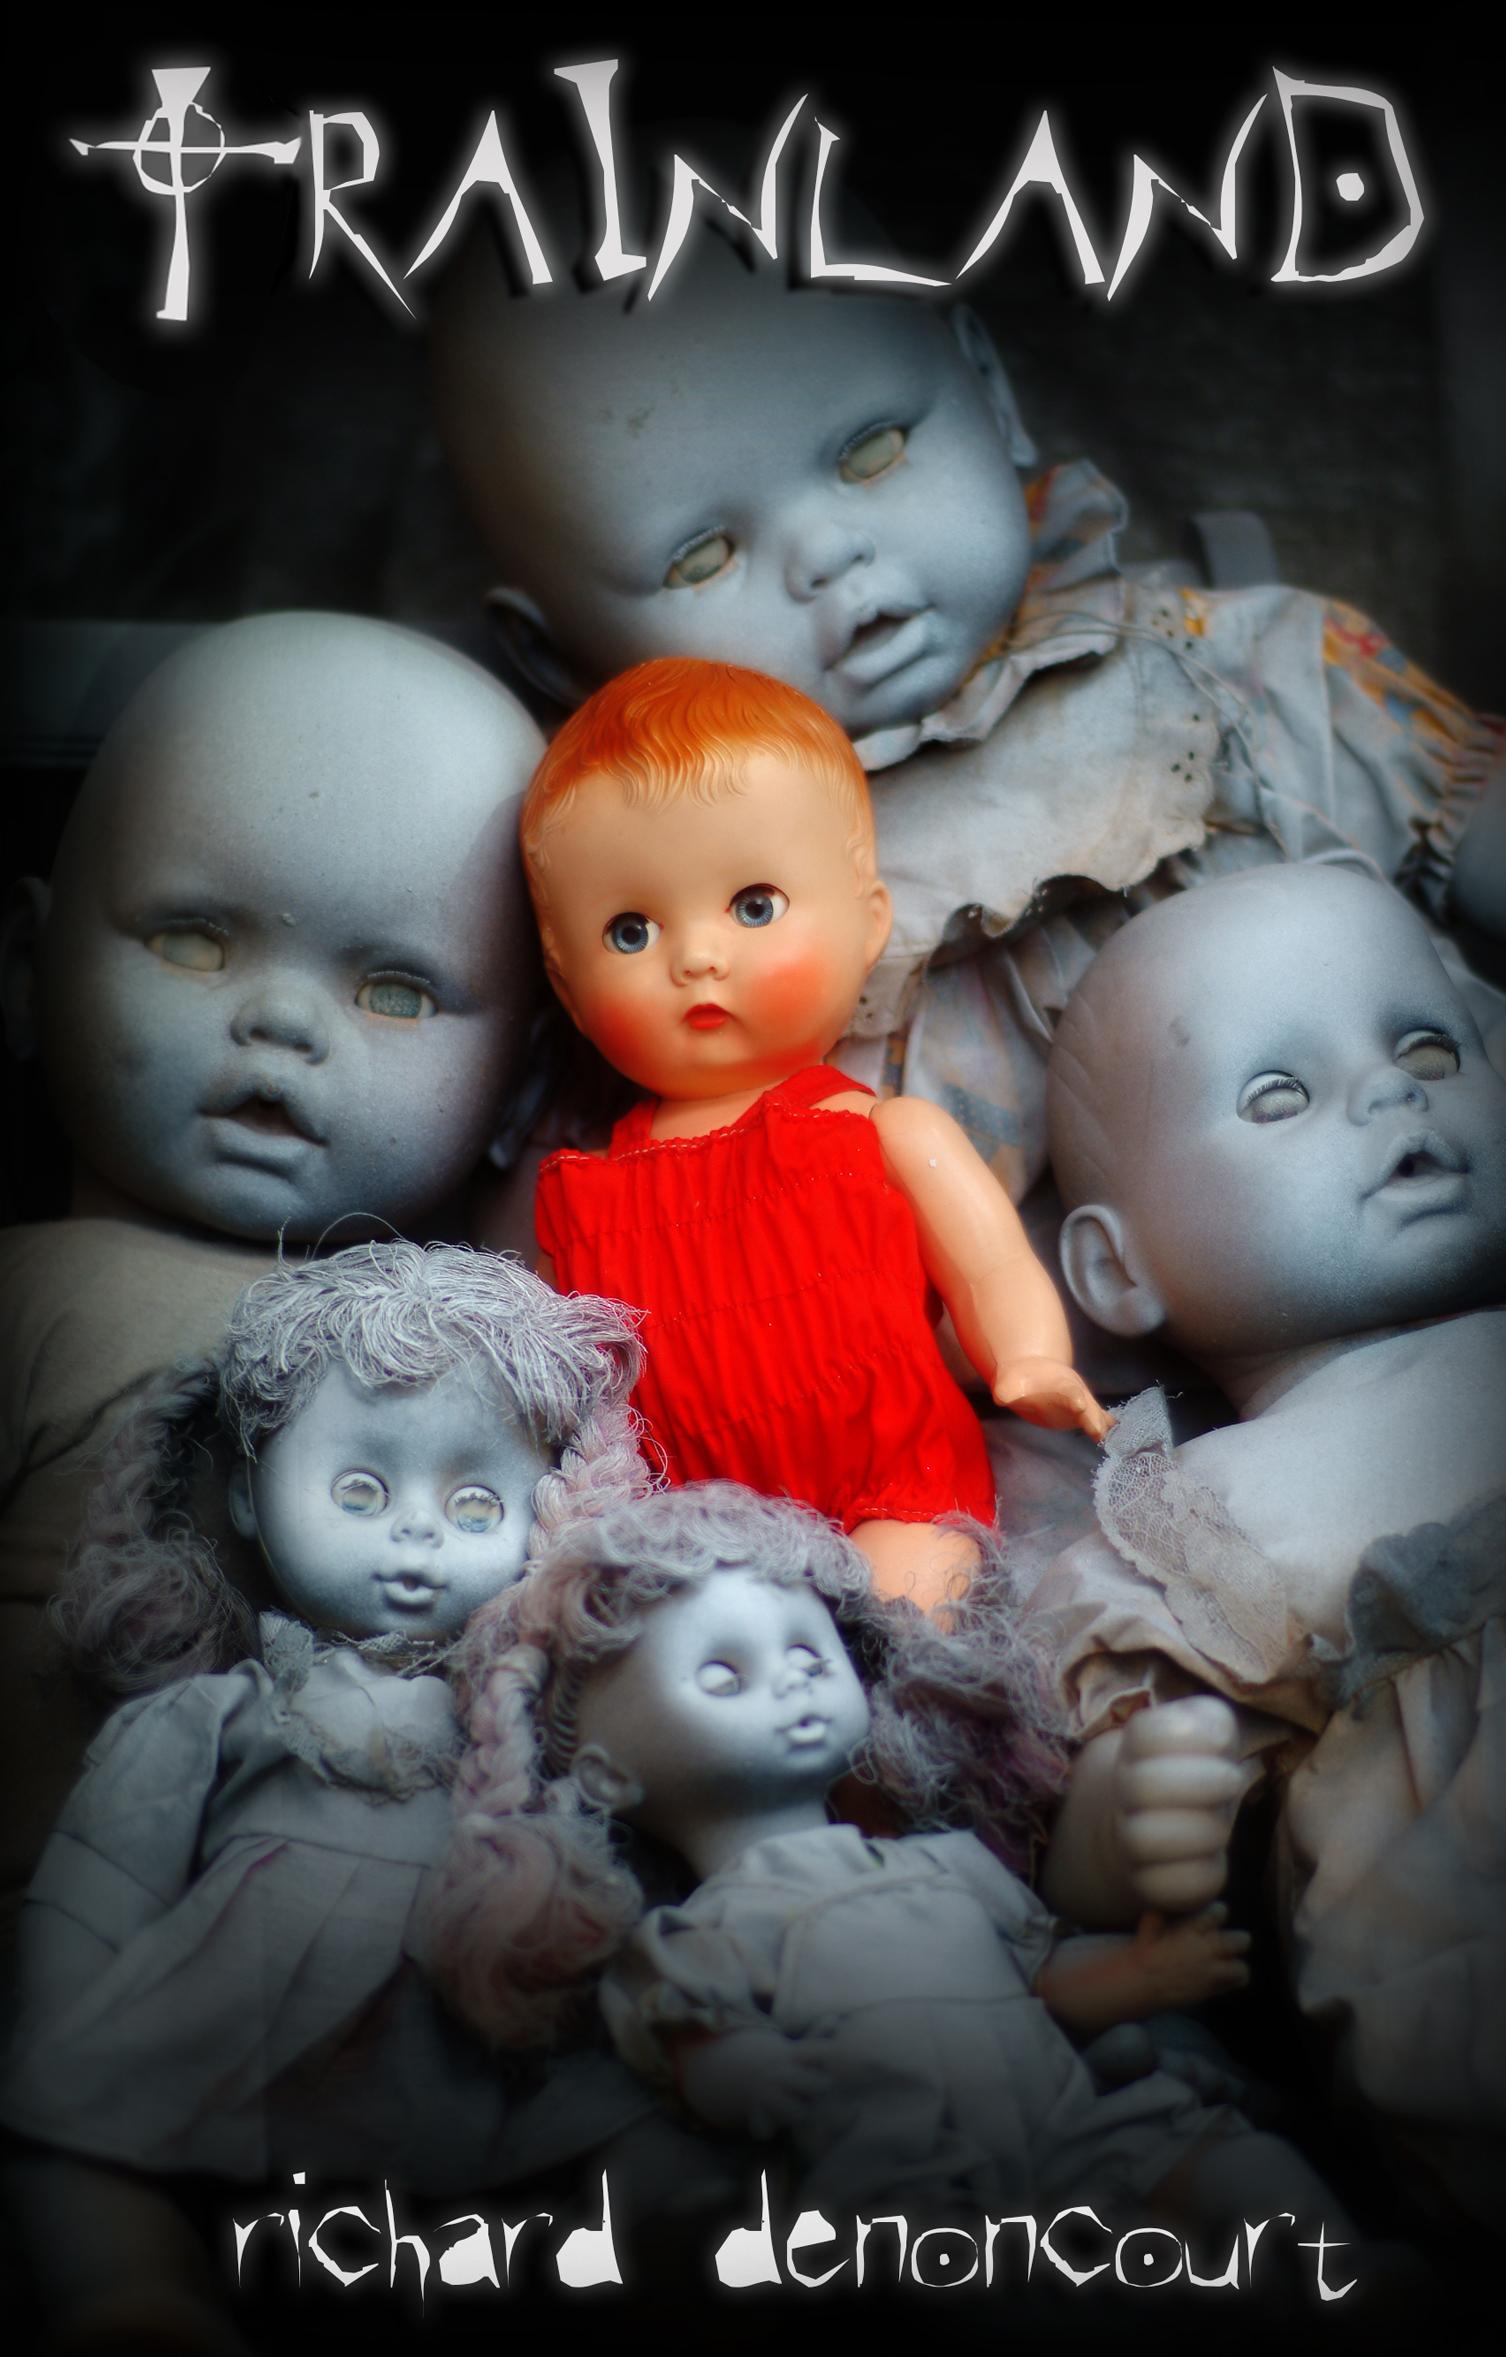 Creepy pile of dolls eBook cover REVISED.jpg